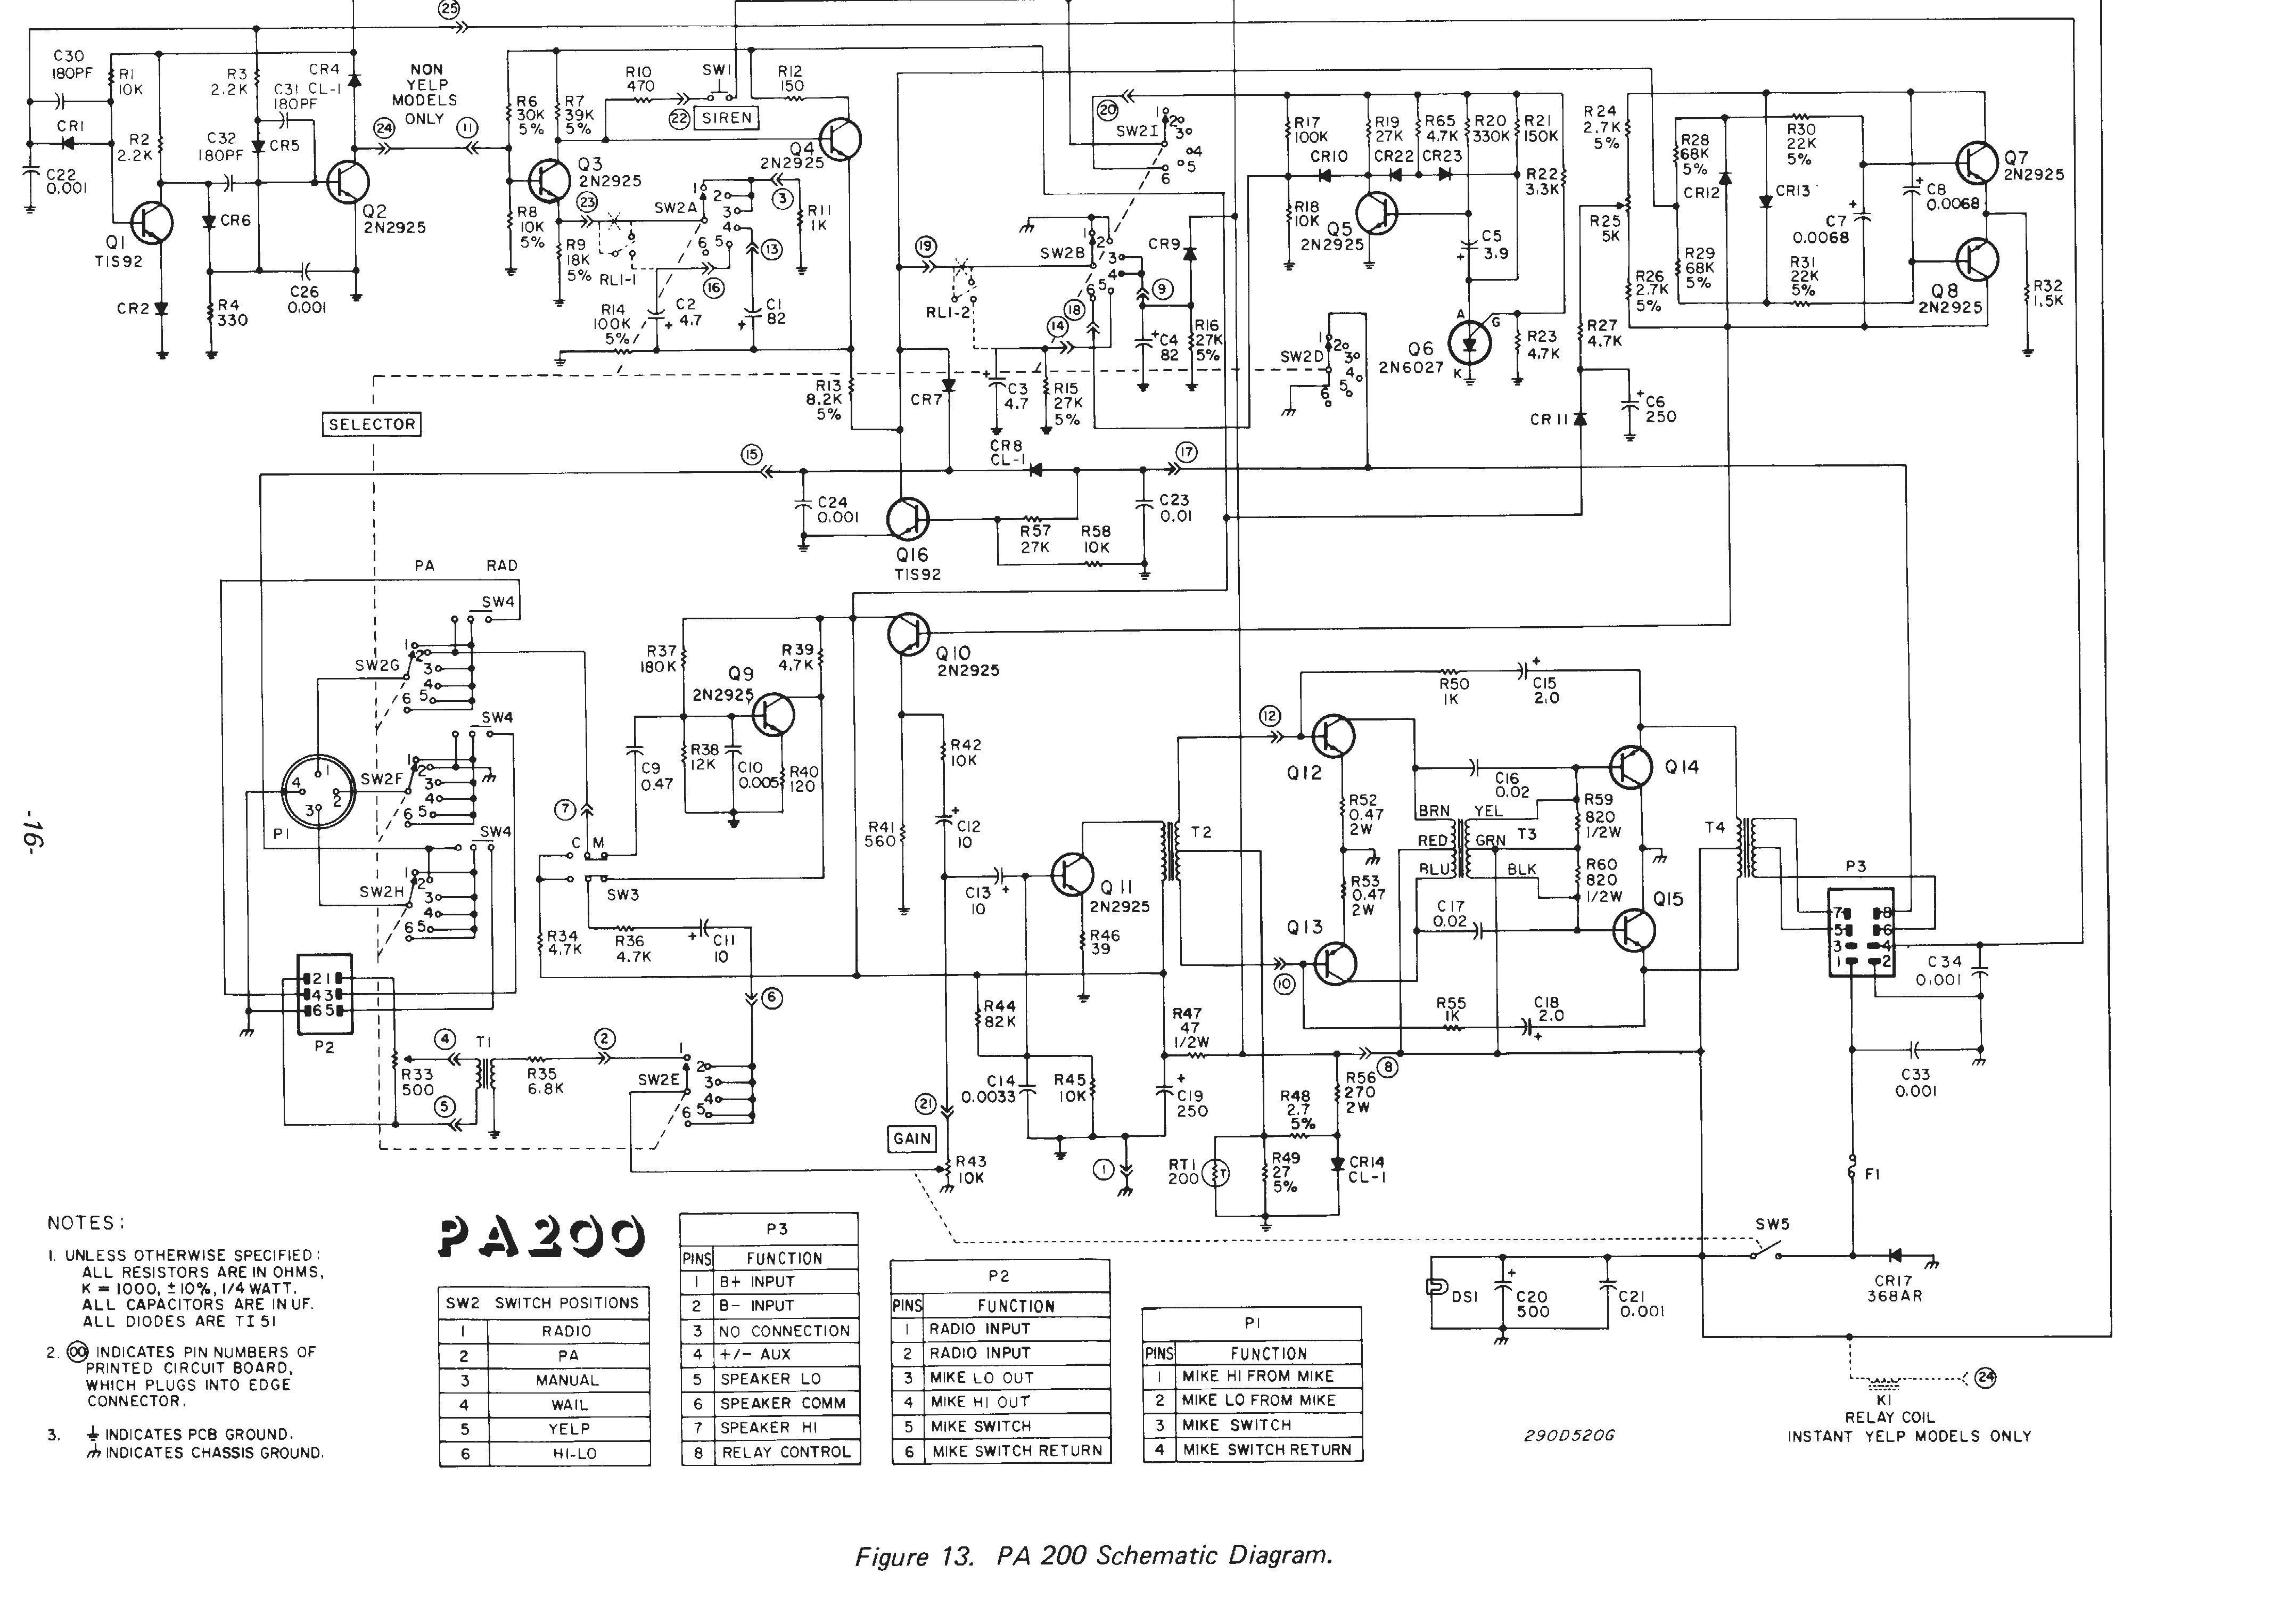 federal siren wiring diagram wiring diagram radio wiring diagram federal siren pa300 wiring diagram 18 1 classroomleader co \\u2022federal signal pa300 wiring diagram wirings